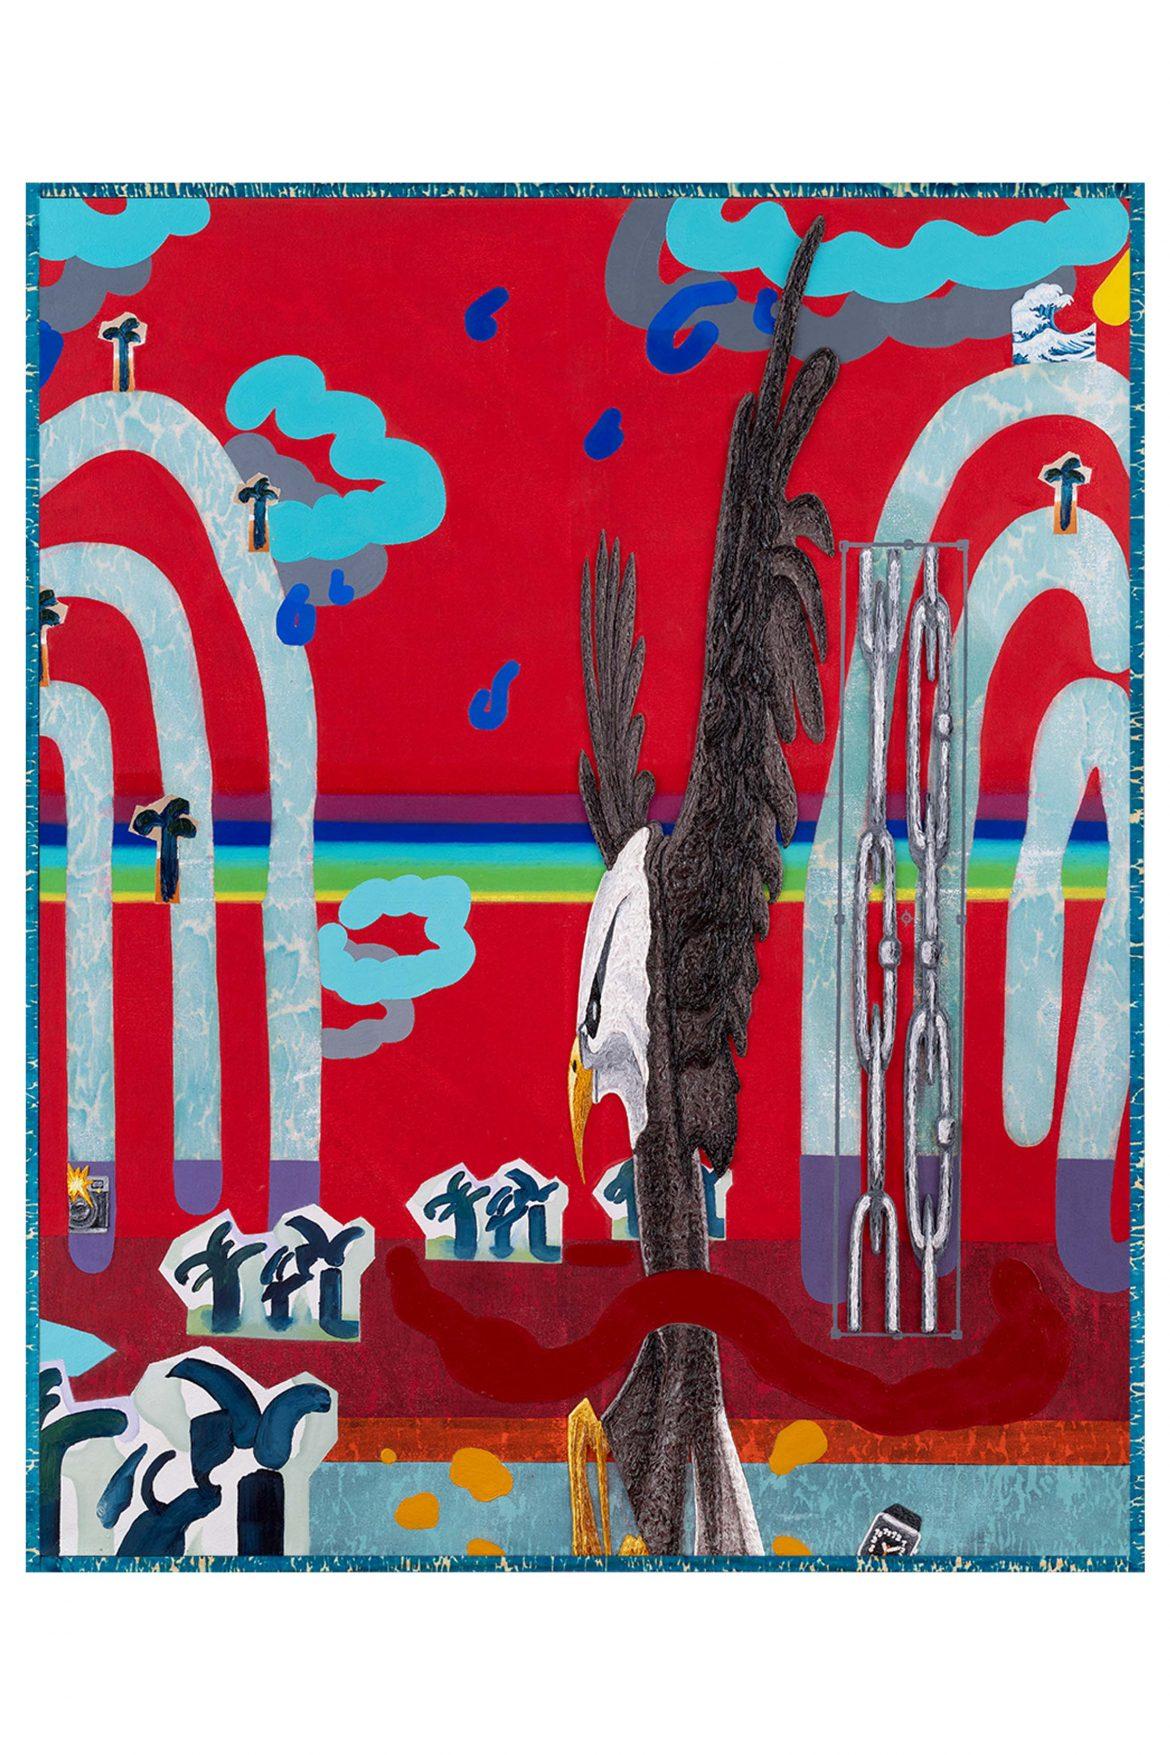 Hell Gette, Fotograf: Kilian Blees, Galerie Nagel Draxler